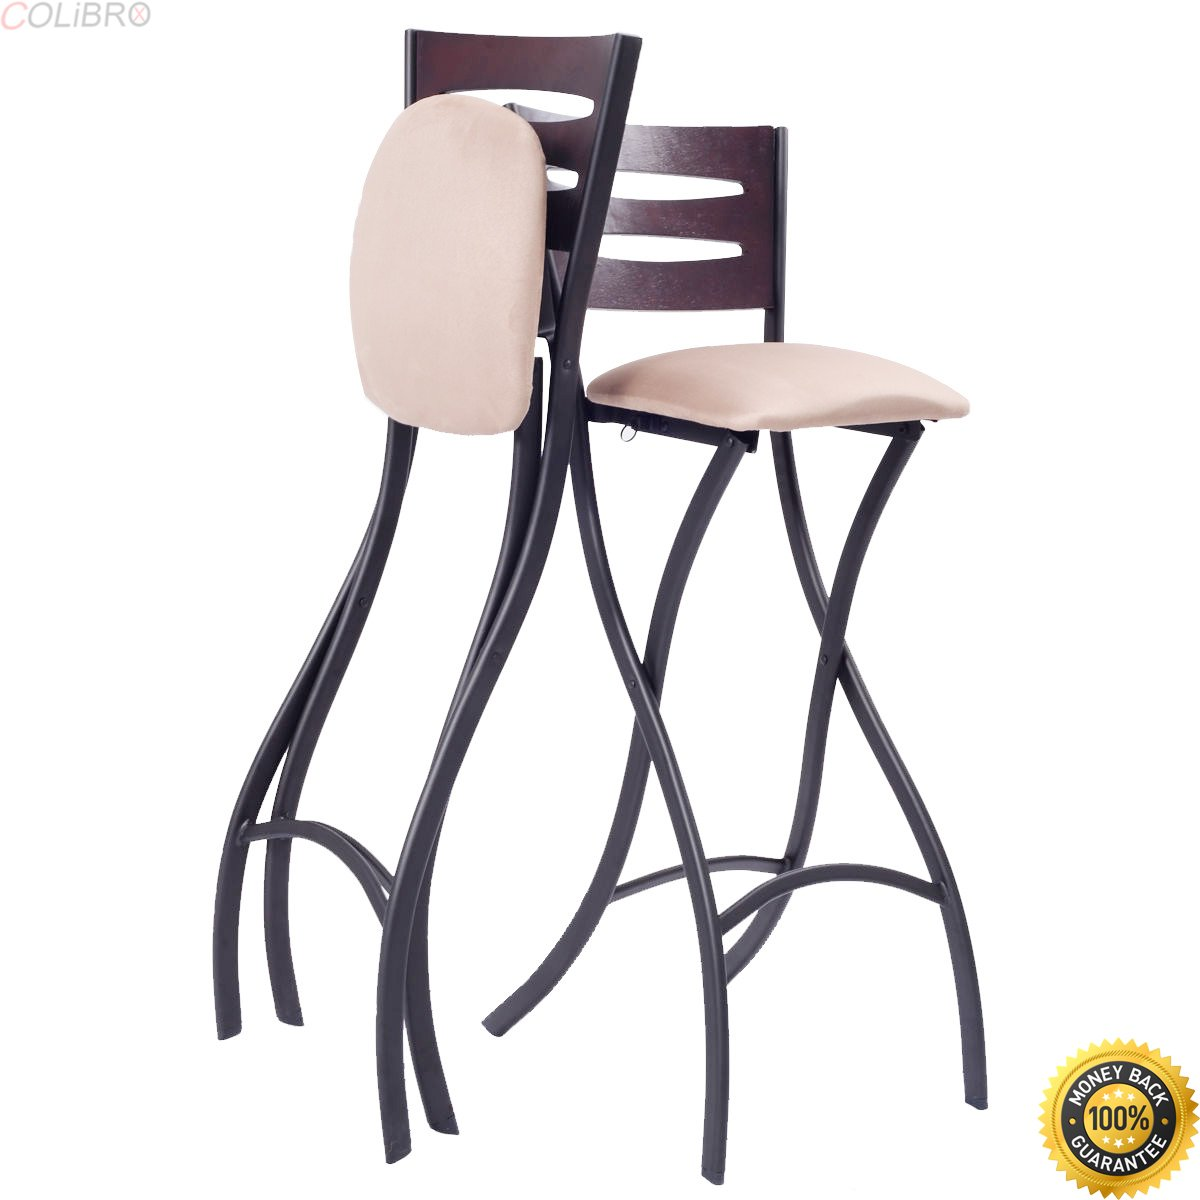 Colibrox set of 2 folding counter bar stools bistro dining kitchen pub chair furniturekitchen island bar stoolskitchen counter stools with backs bar